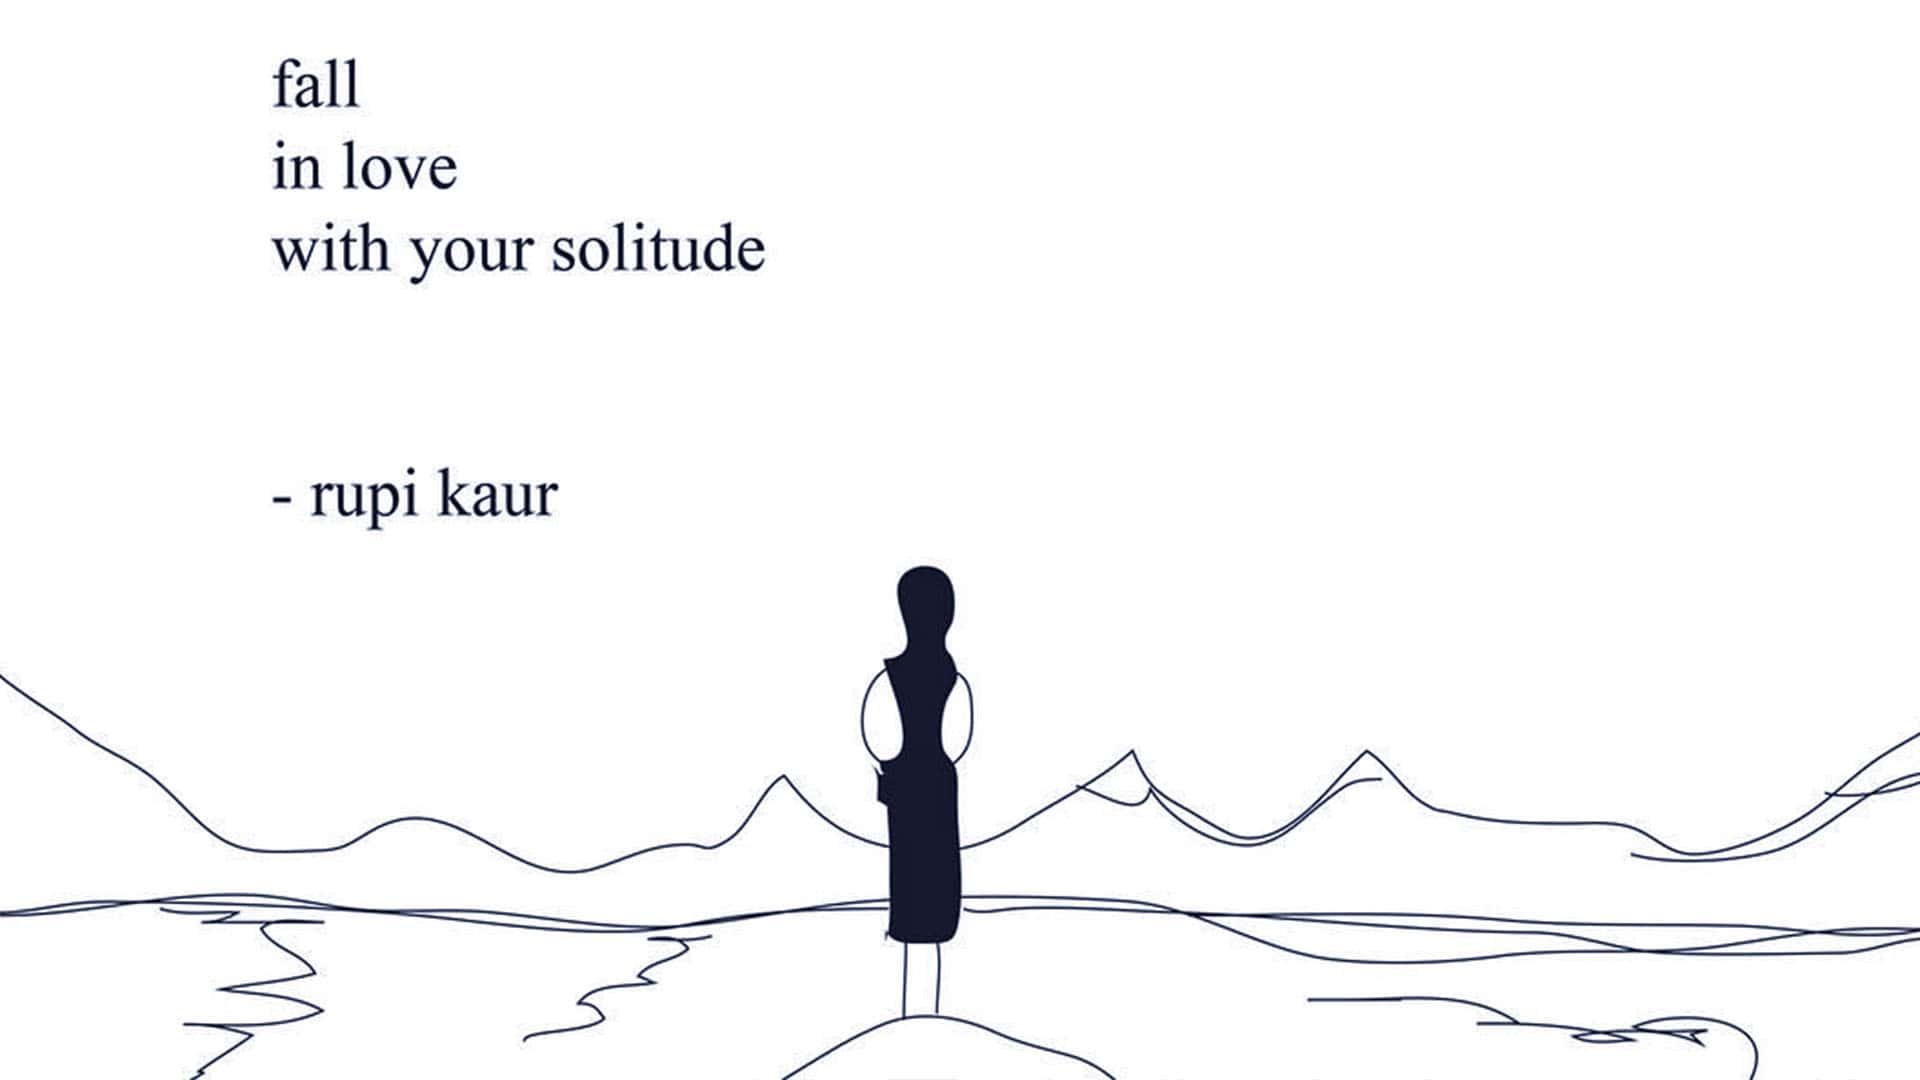 Rupi Kaur è una famosa Instapoet